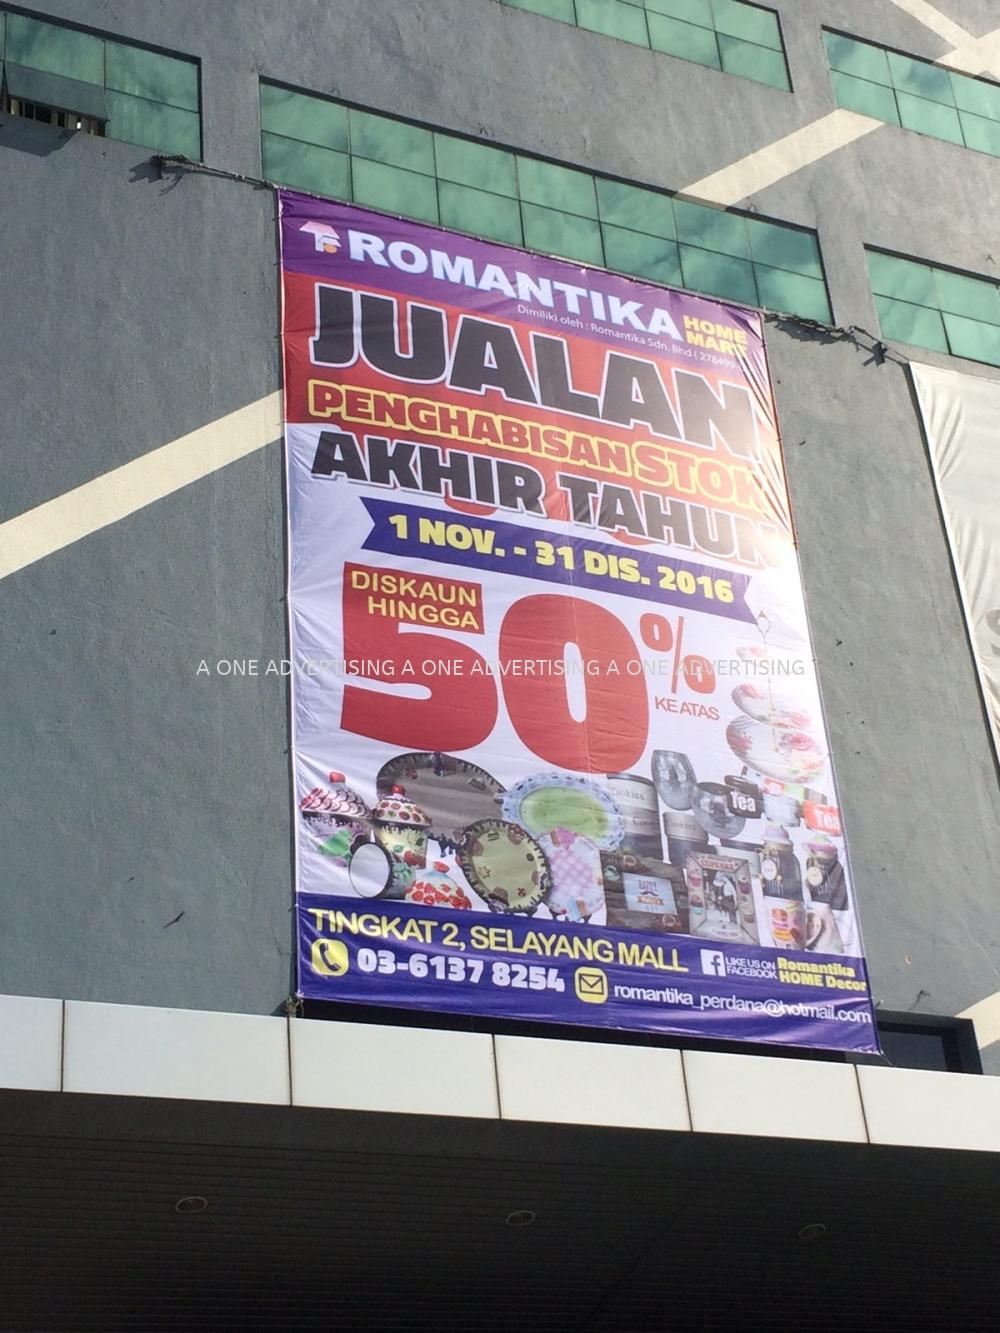 d427e4d19b6 Romantika At Selayang Mall Giant Banner Selangor, Kuala Lumpur (KL ...